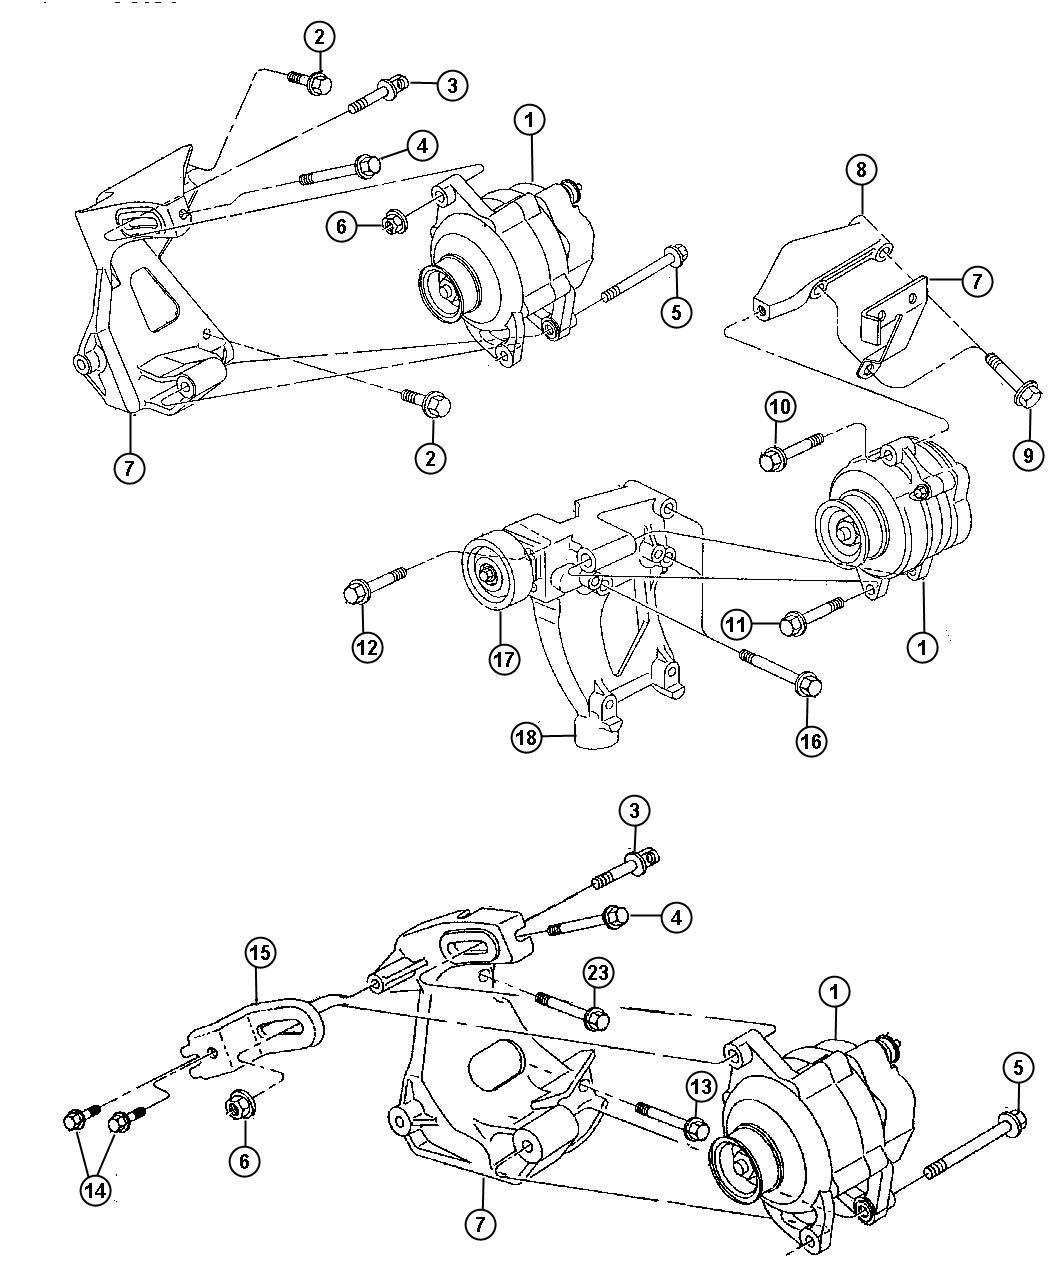 Alternator And Pulley Generator